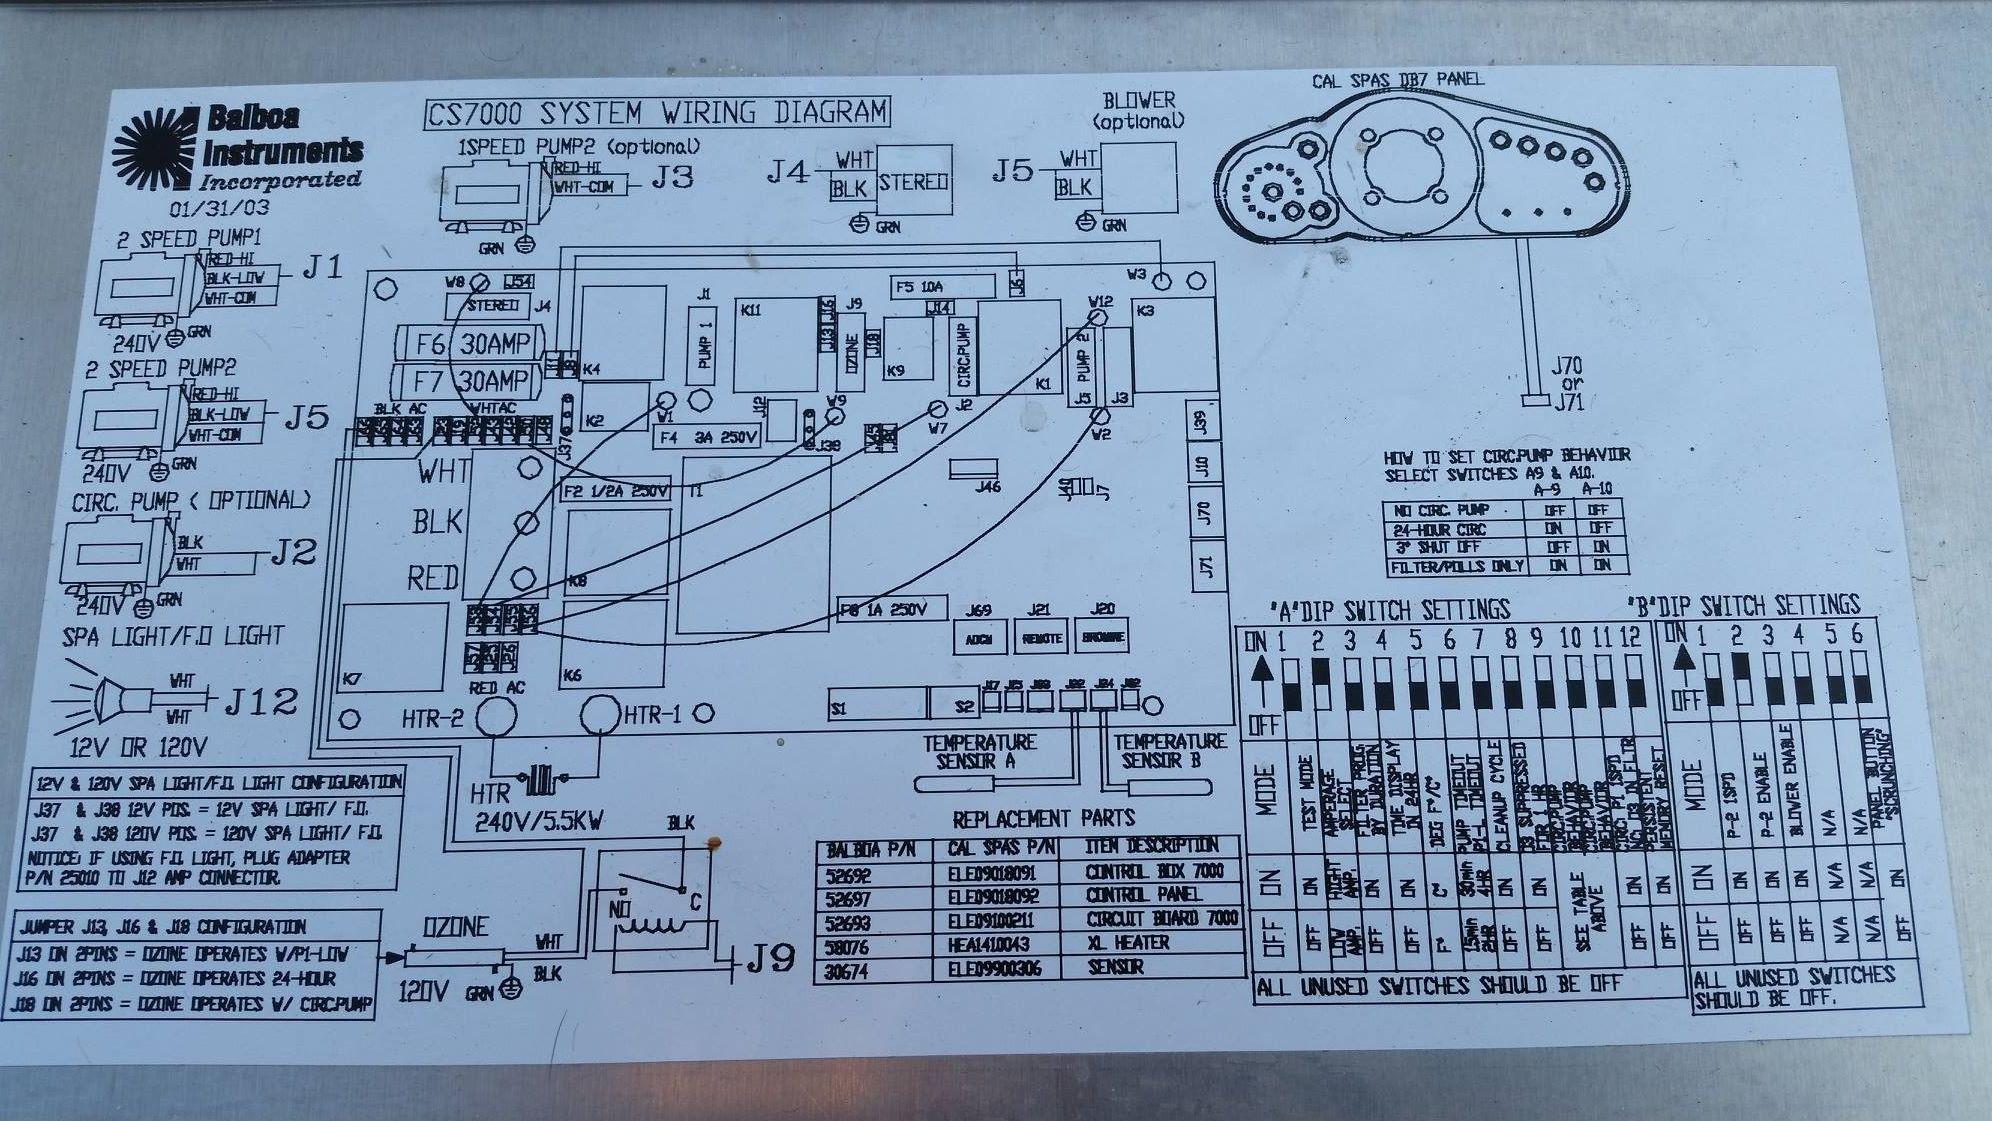 1994 Cal Spa Wiring Diagram Circulation Pump Dolgularcomdesign